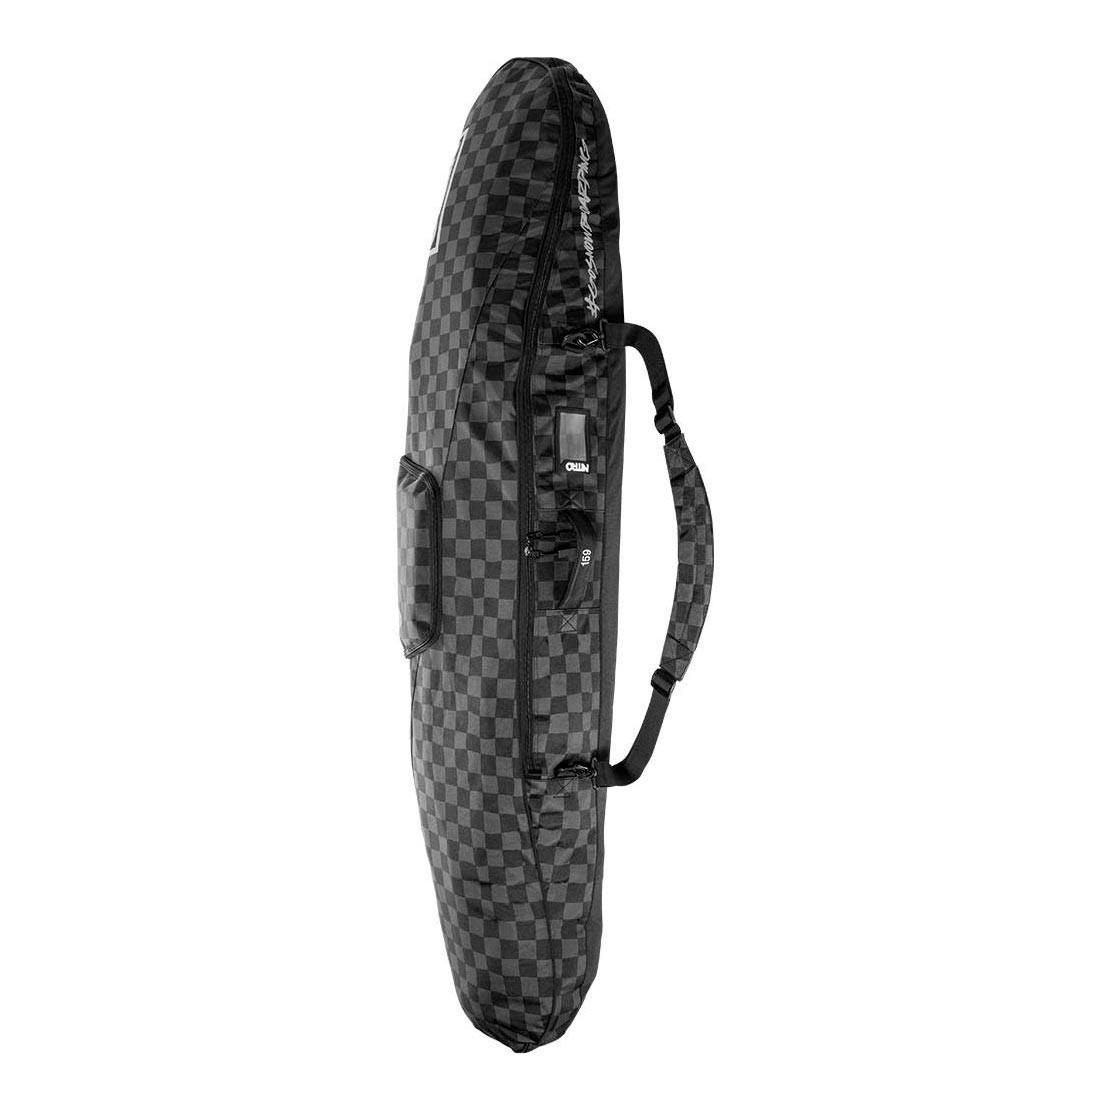 Obal na snowboard Nitro Sub Board Bag checker vel.169 16/17 + doručení do 24 hodin